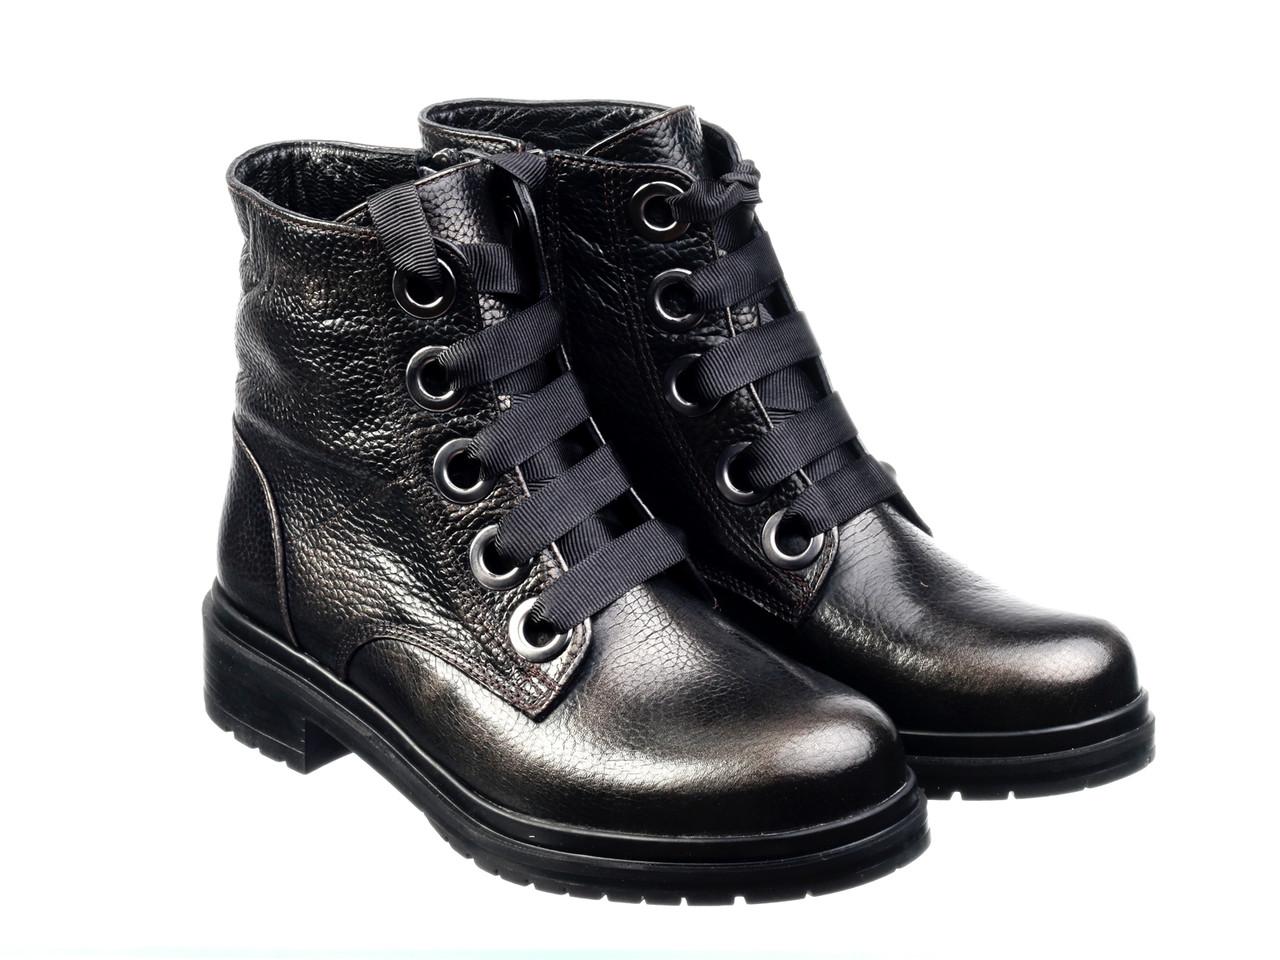 Ботинки Etor 6594-7211 бронза, фото 1